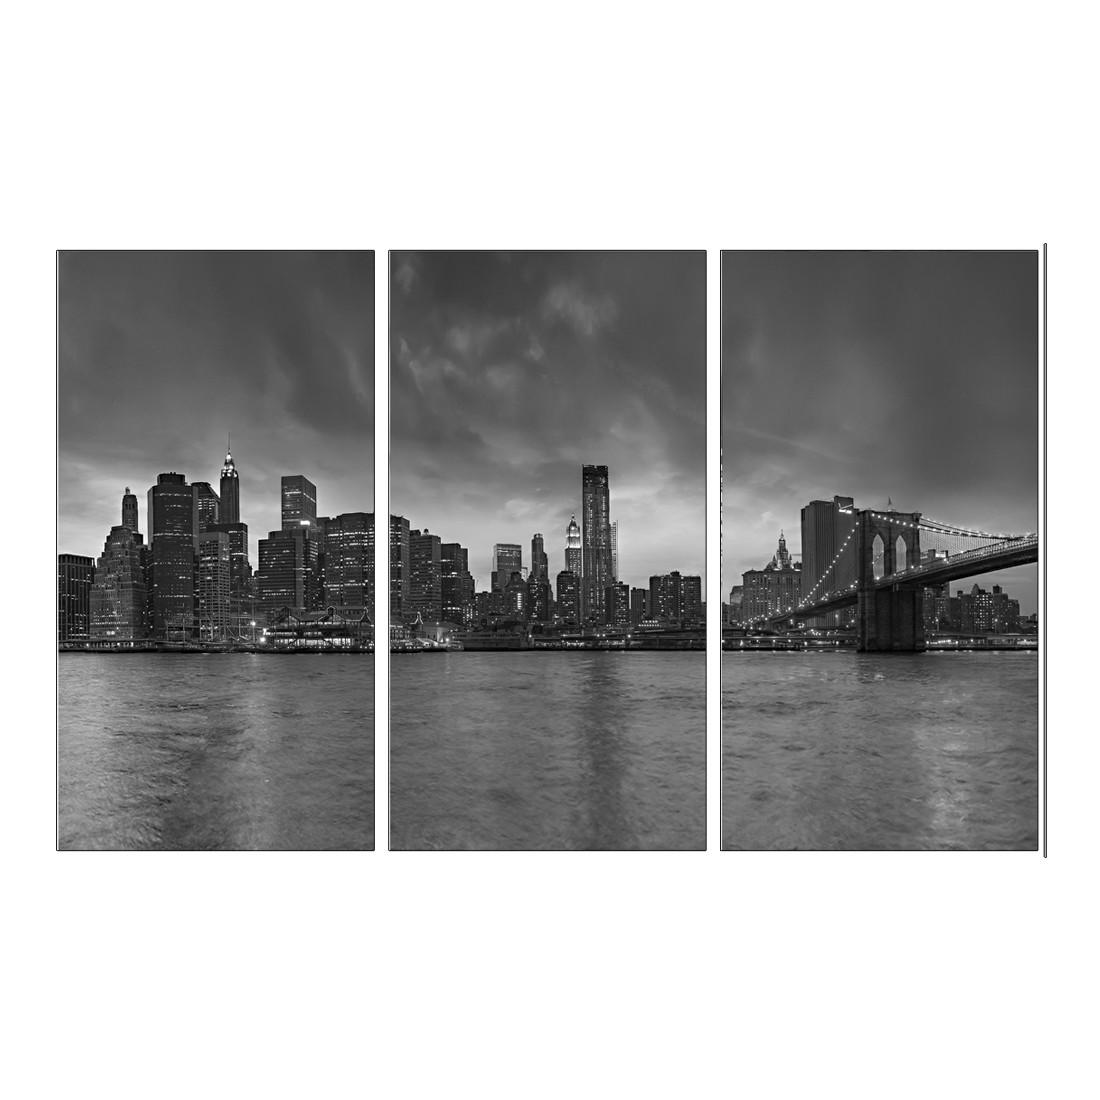 Leinwandbild BLACK & WHITE MANHATTAN 3 – Abmessung 130 x 80 cm, Gallery of Innovative Art günstig